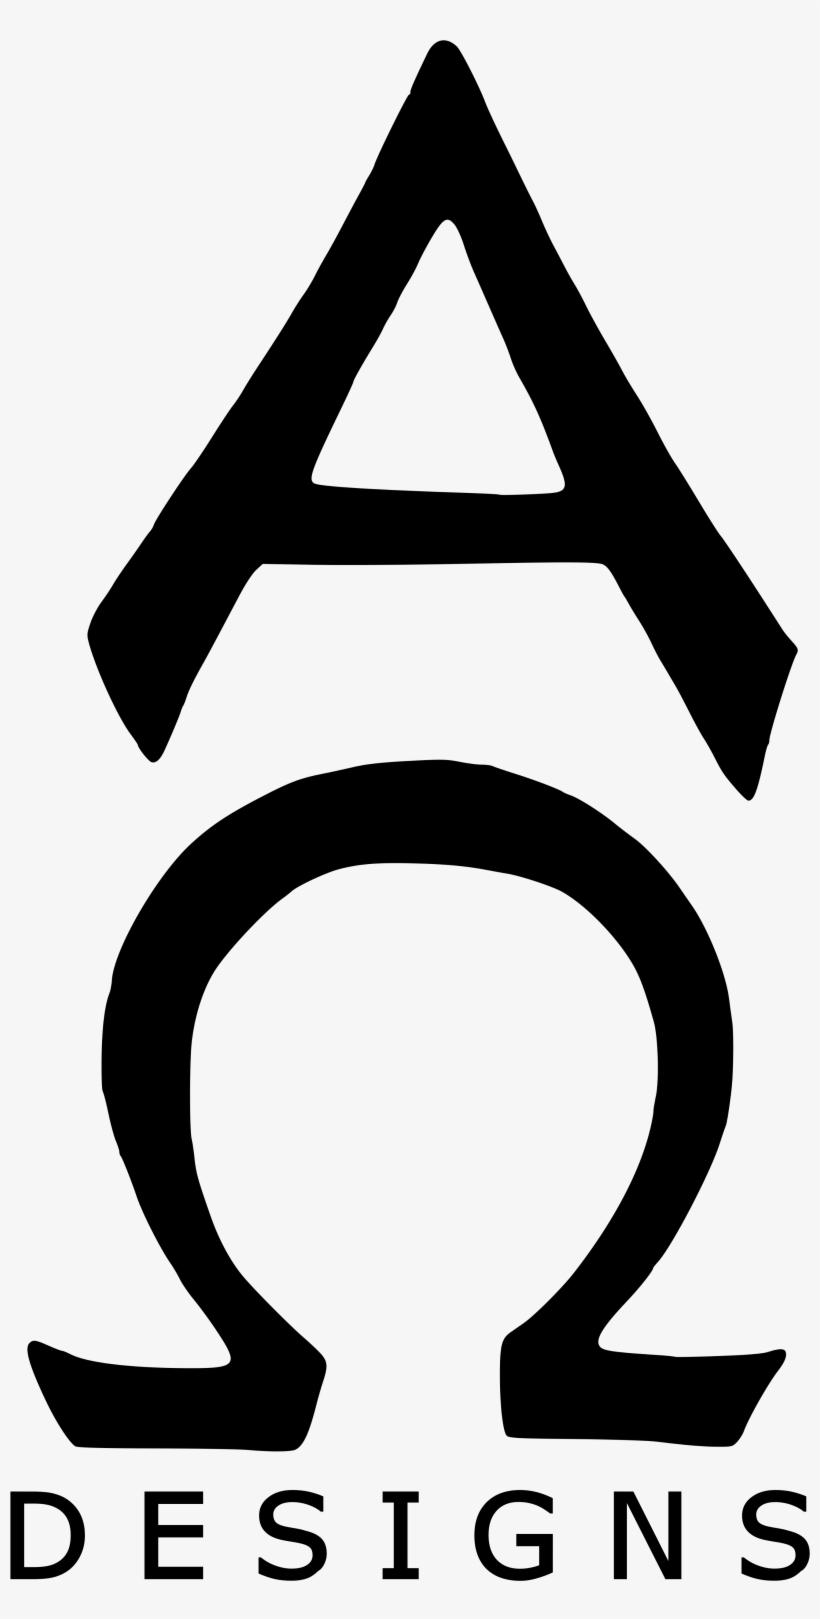 Alpha Omega Symbol Oval Ornament Free Transparent Png Download